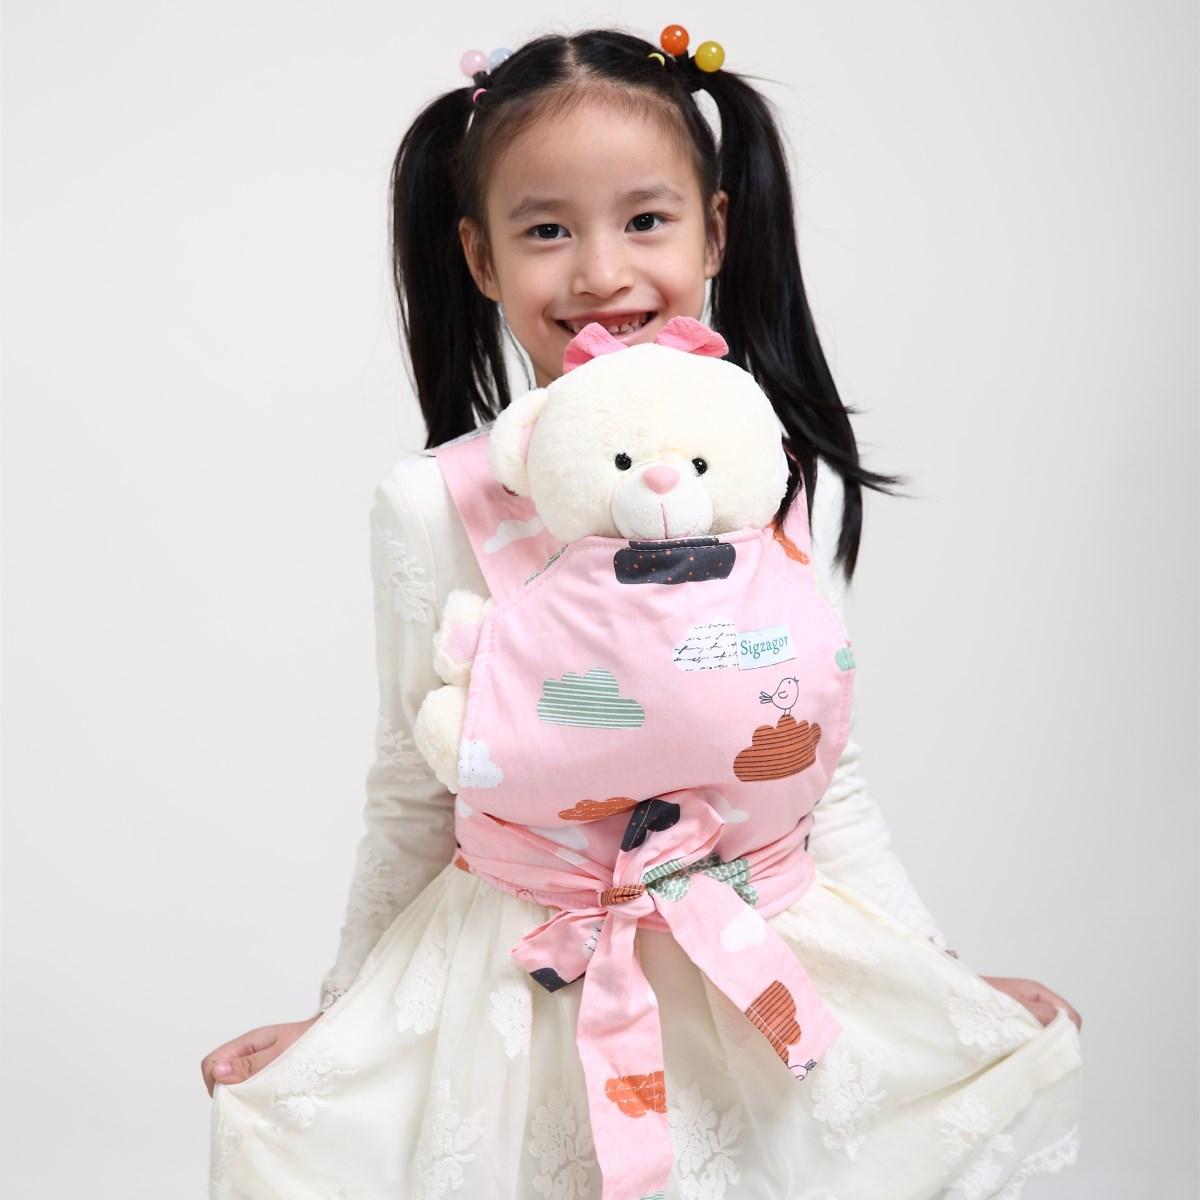 1 Baby Doll Carrier Mei Tai Sling Toddler Birthday Christmas Gift Fox For Girls